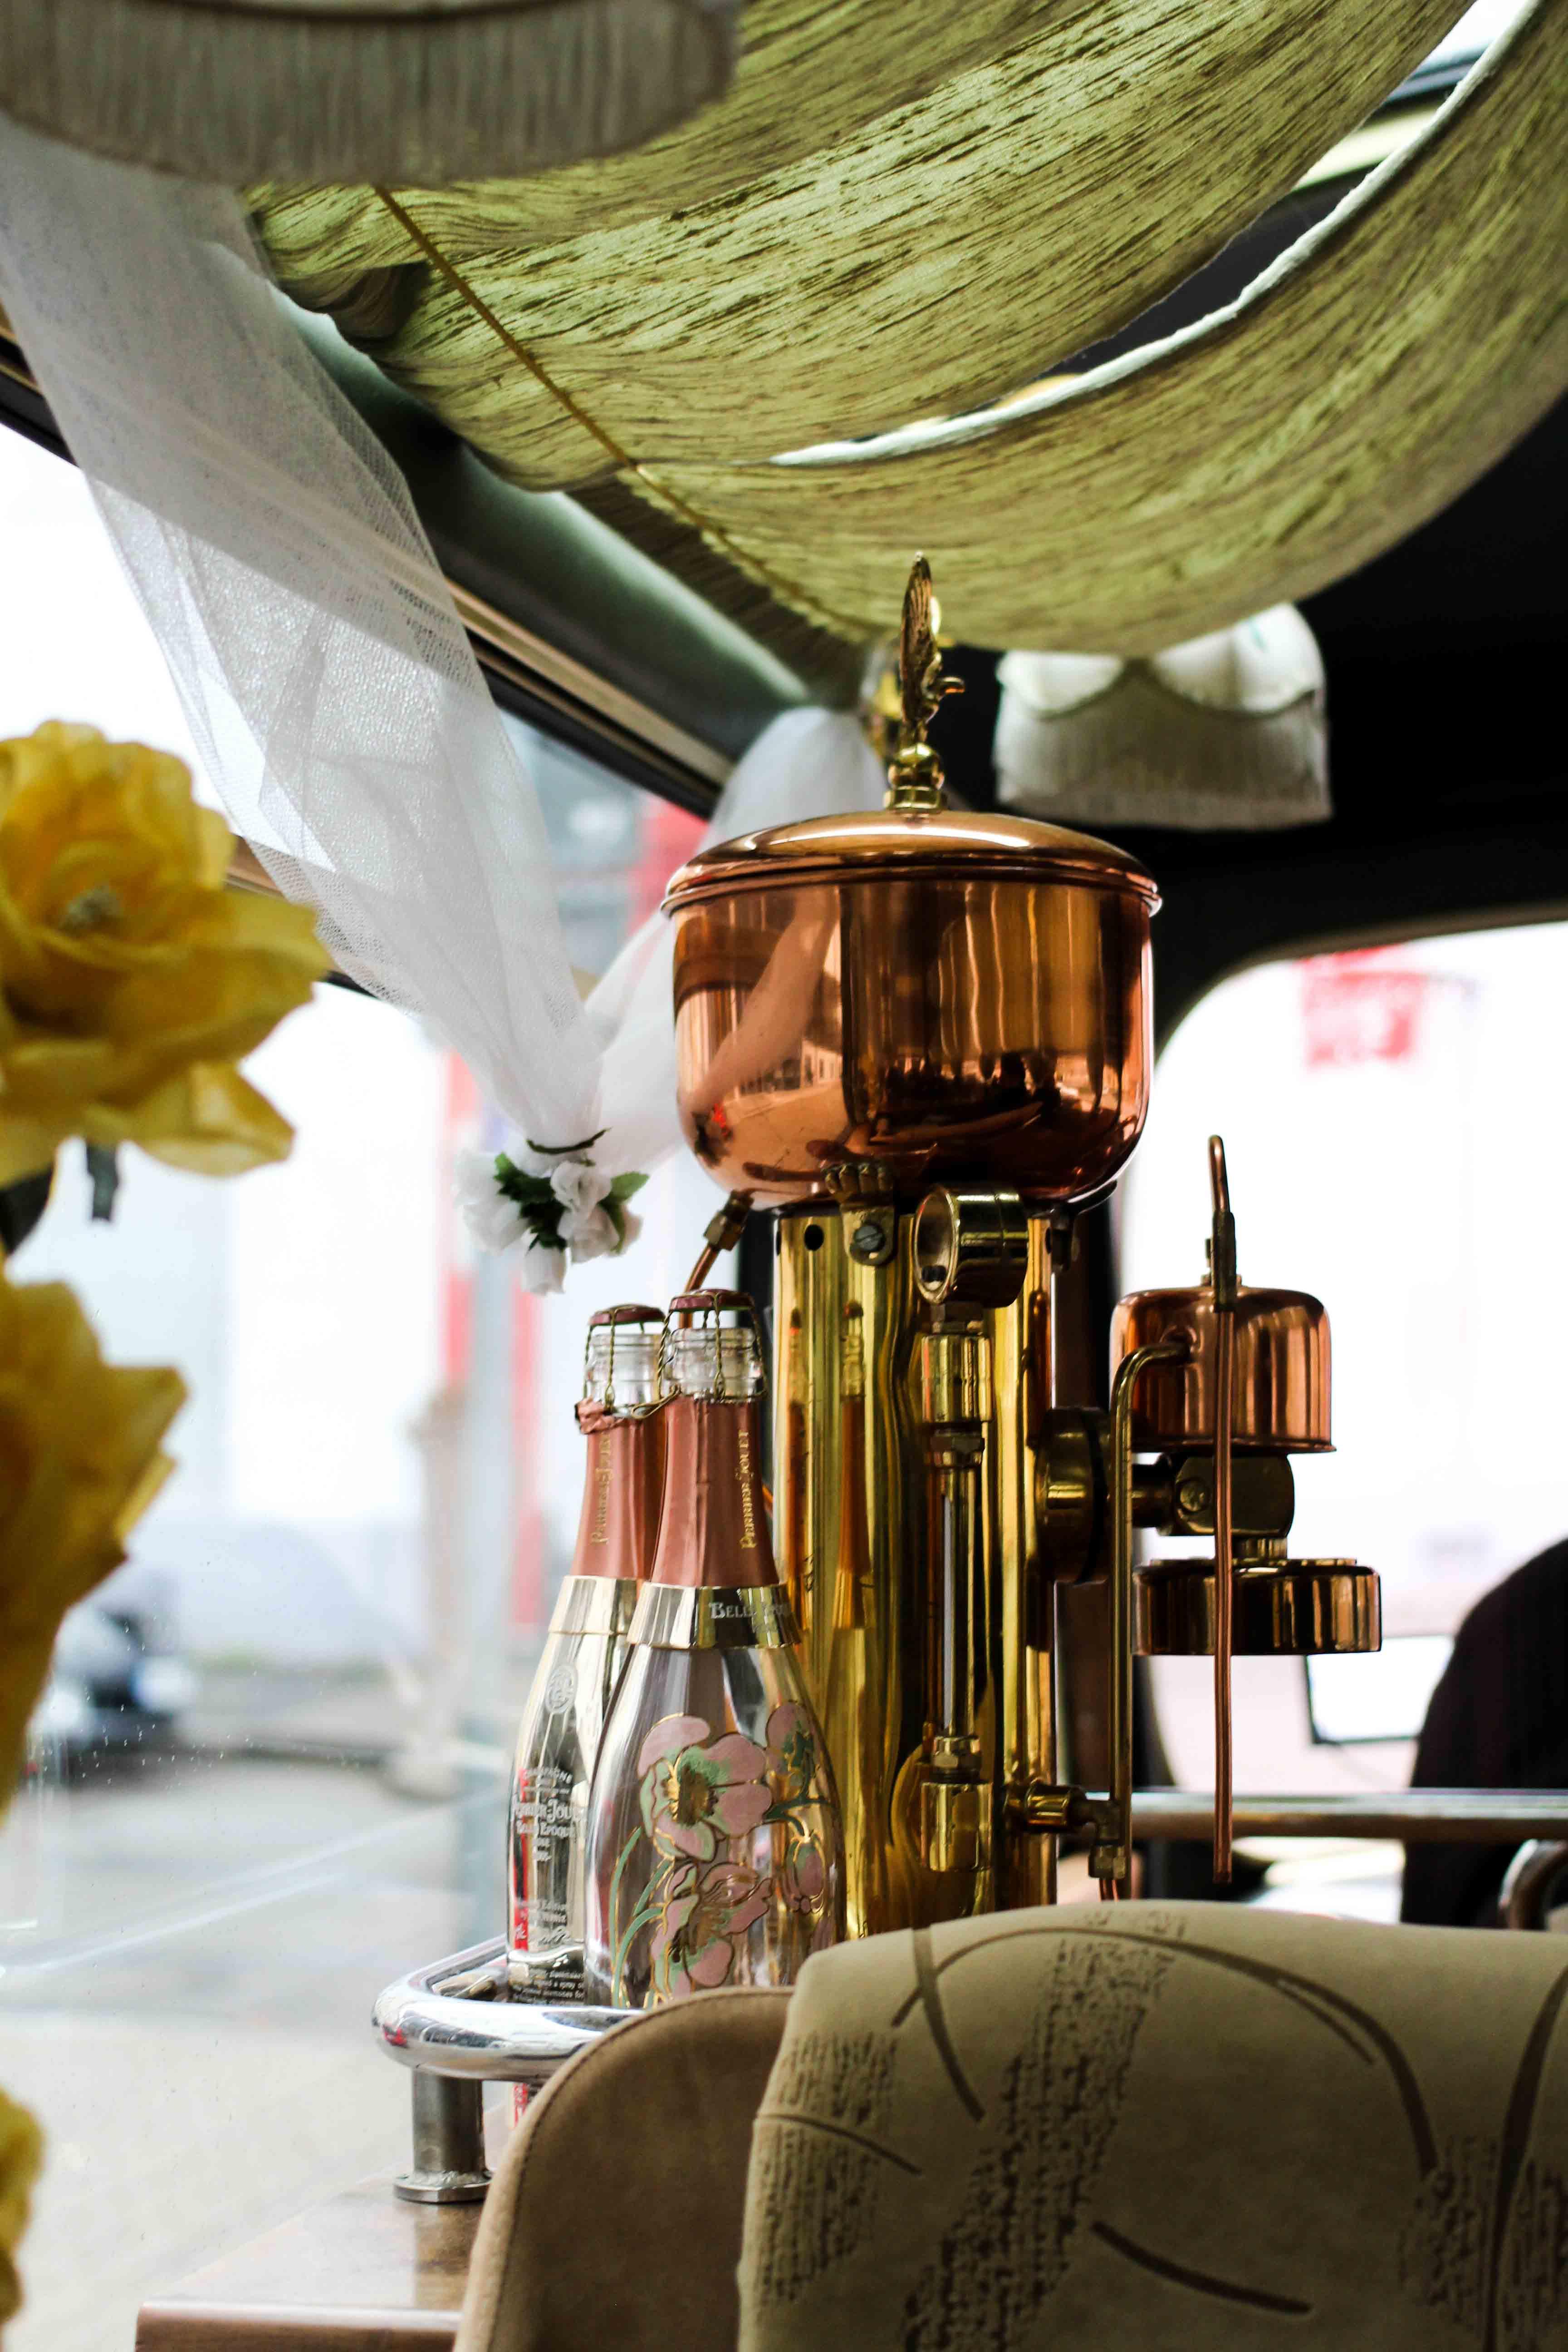 Mercure Weinlese Reiseblog Mercure Mannheim Champagner Bus Bloggerevent